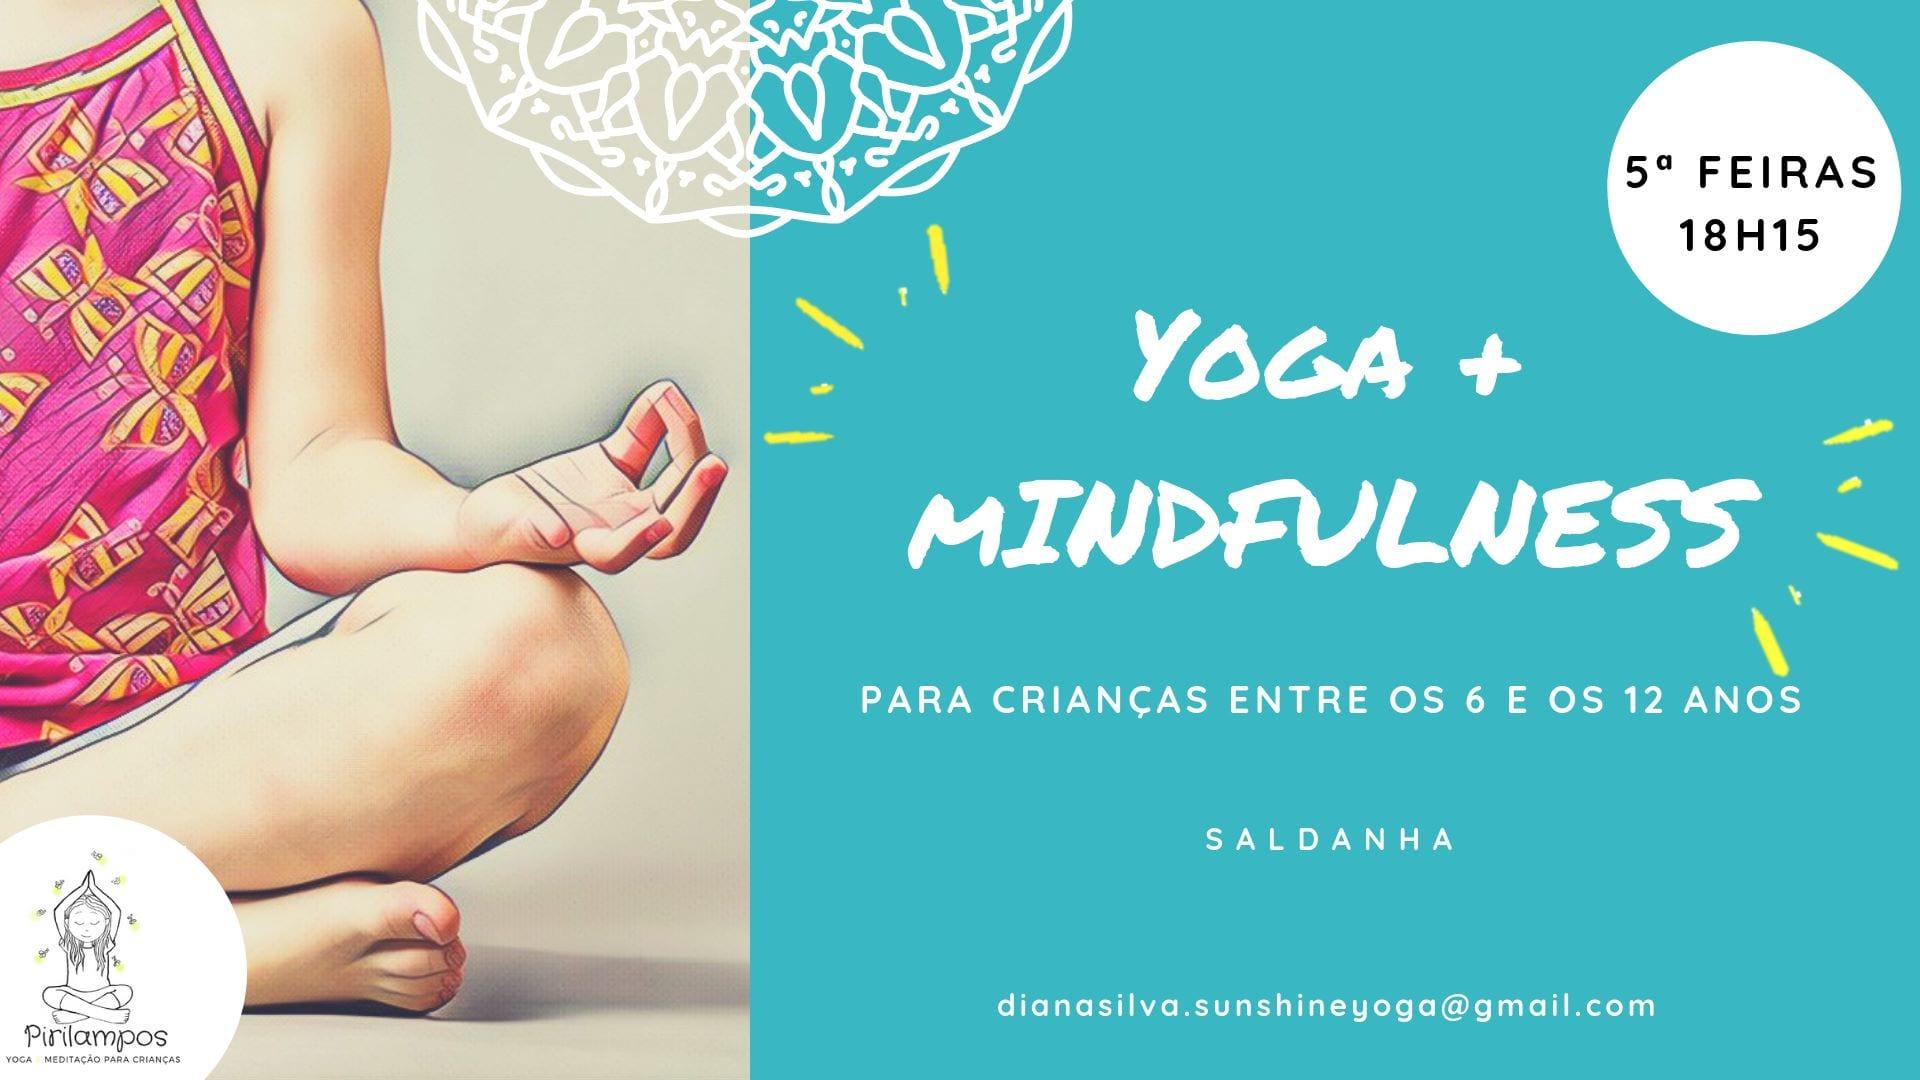 Yoga e Midfullness